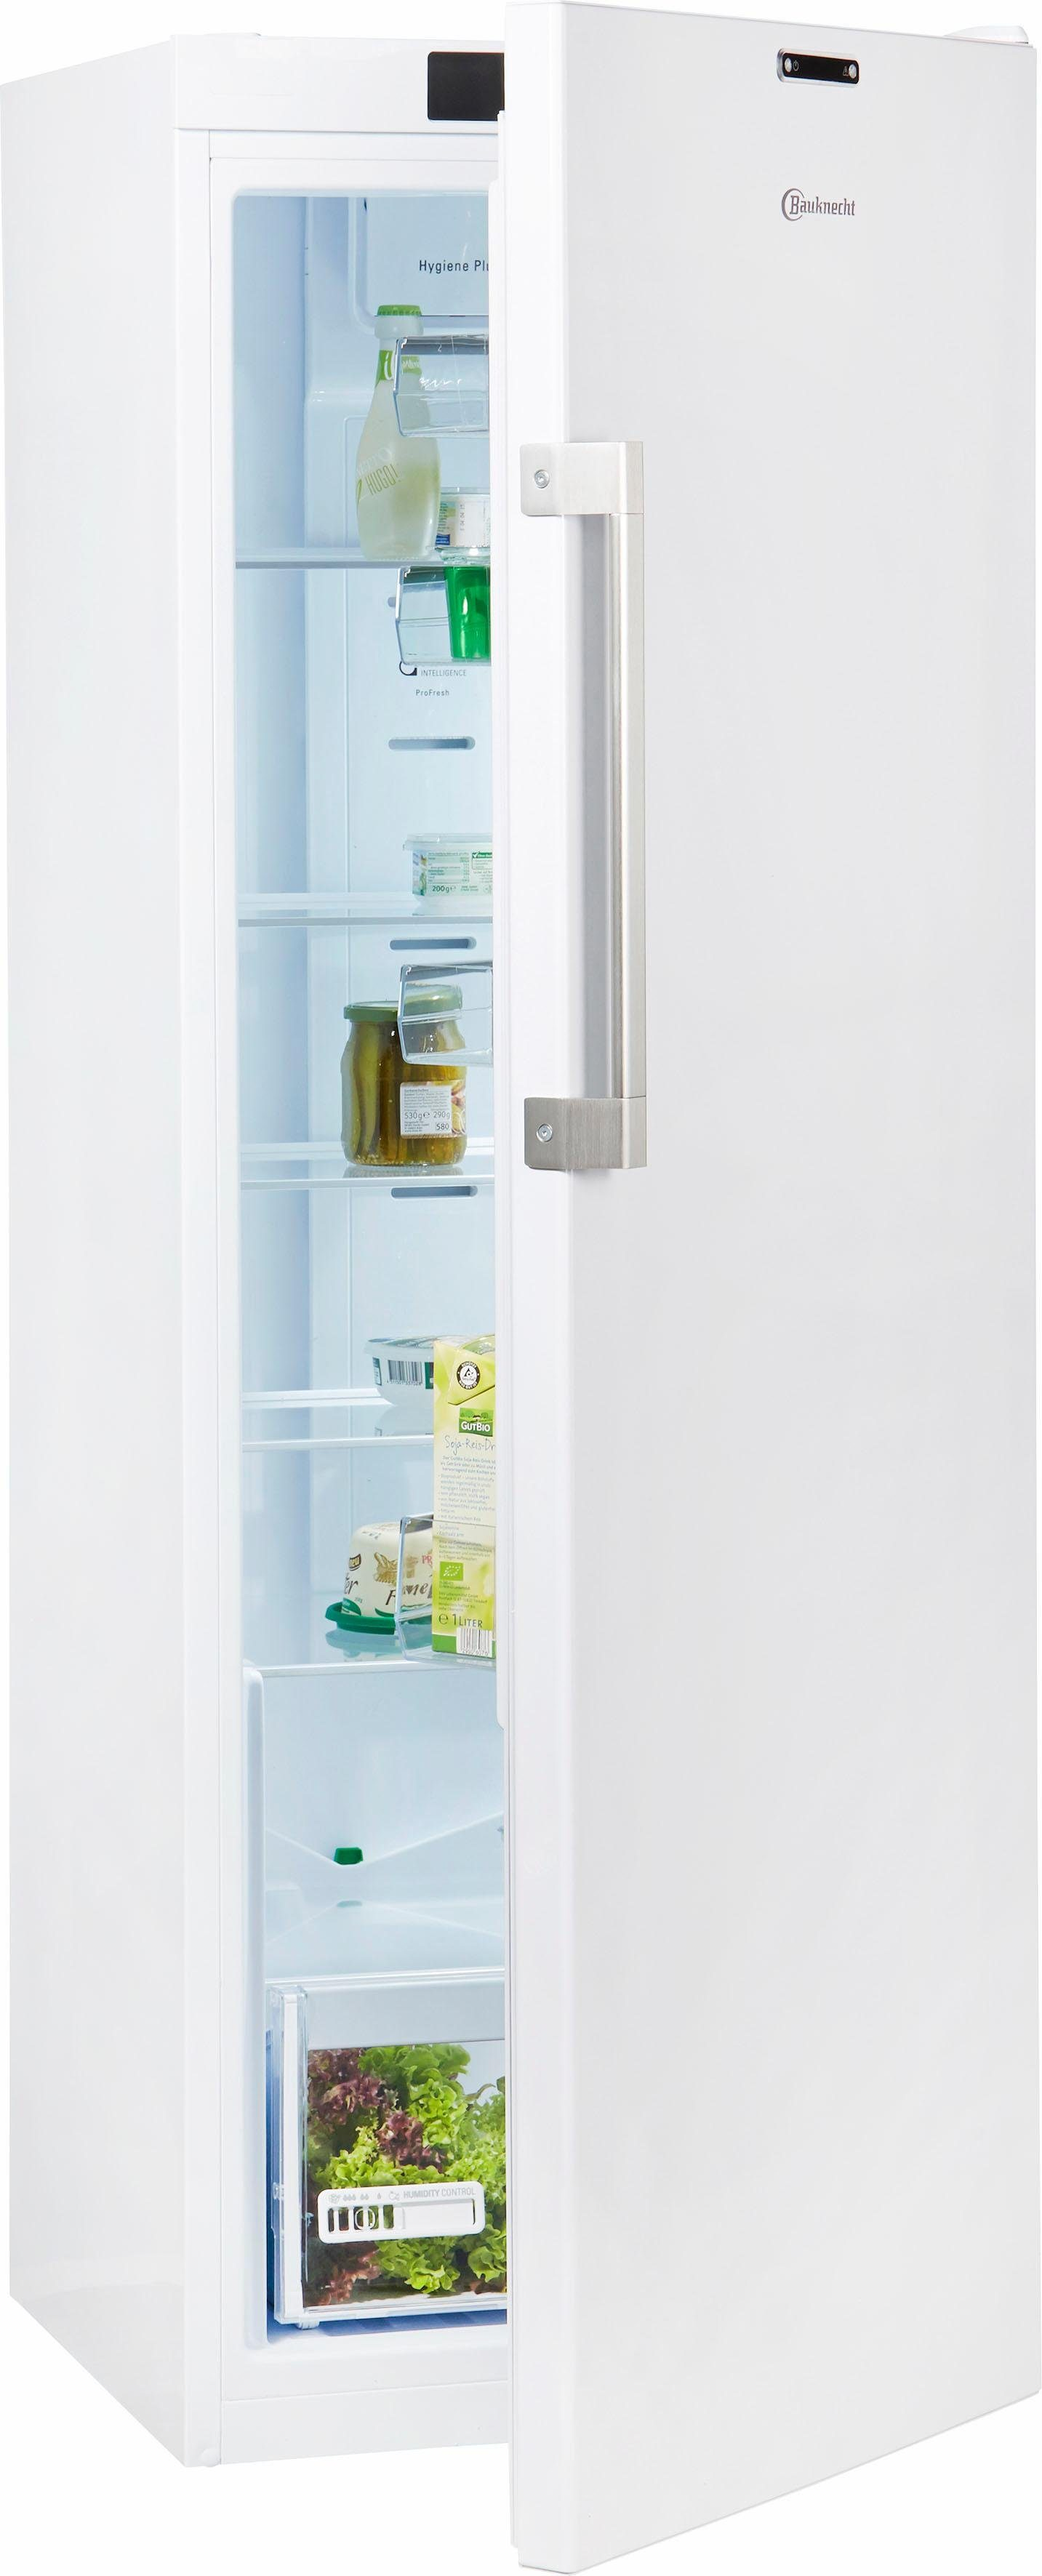 Bauknecht Großraumkühlschrank KR 17G4 A2+ WS, Energieklasse A++, 167 cm hoch, ProFresh